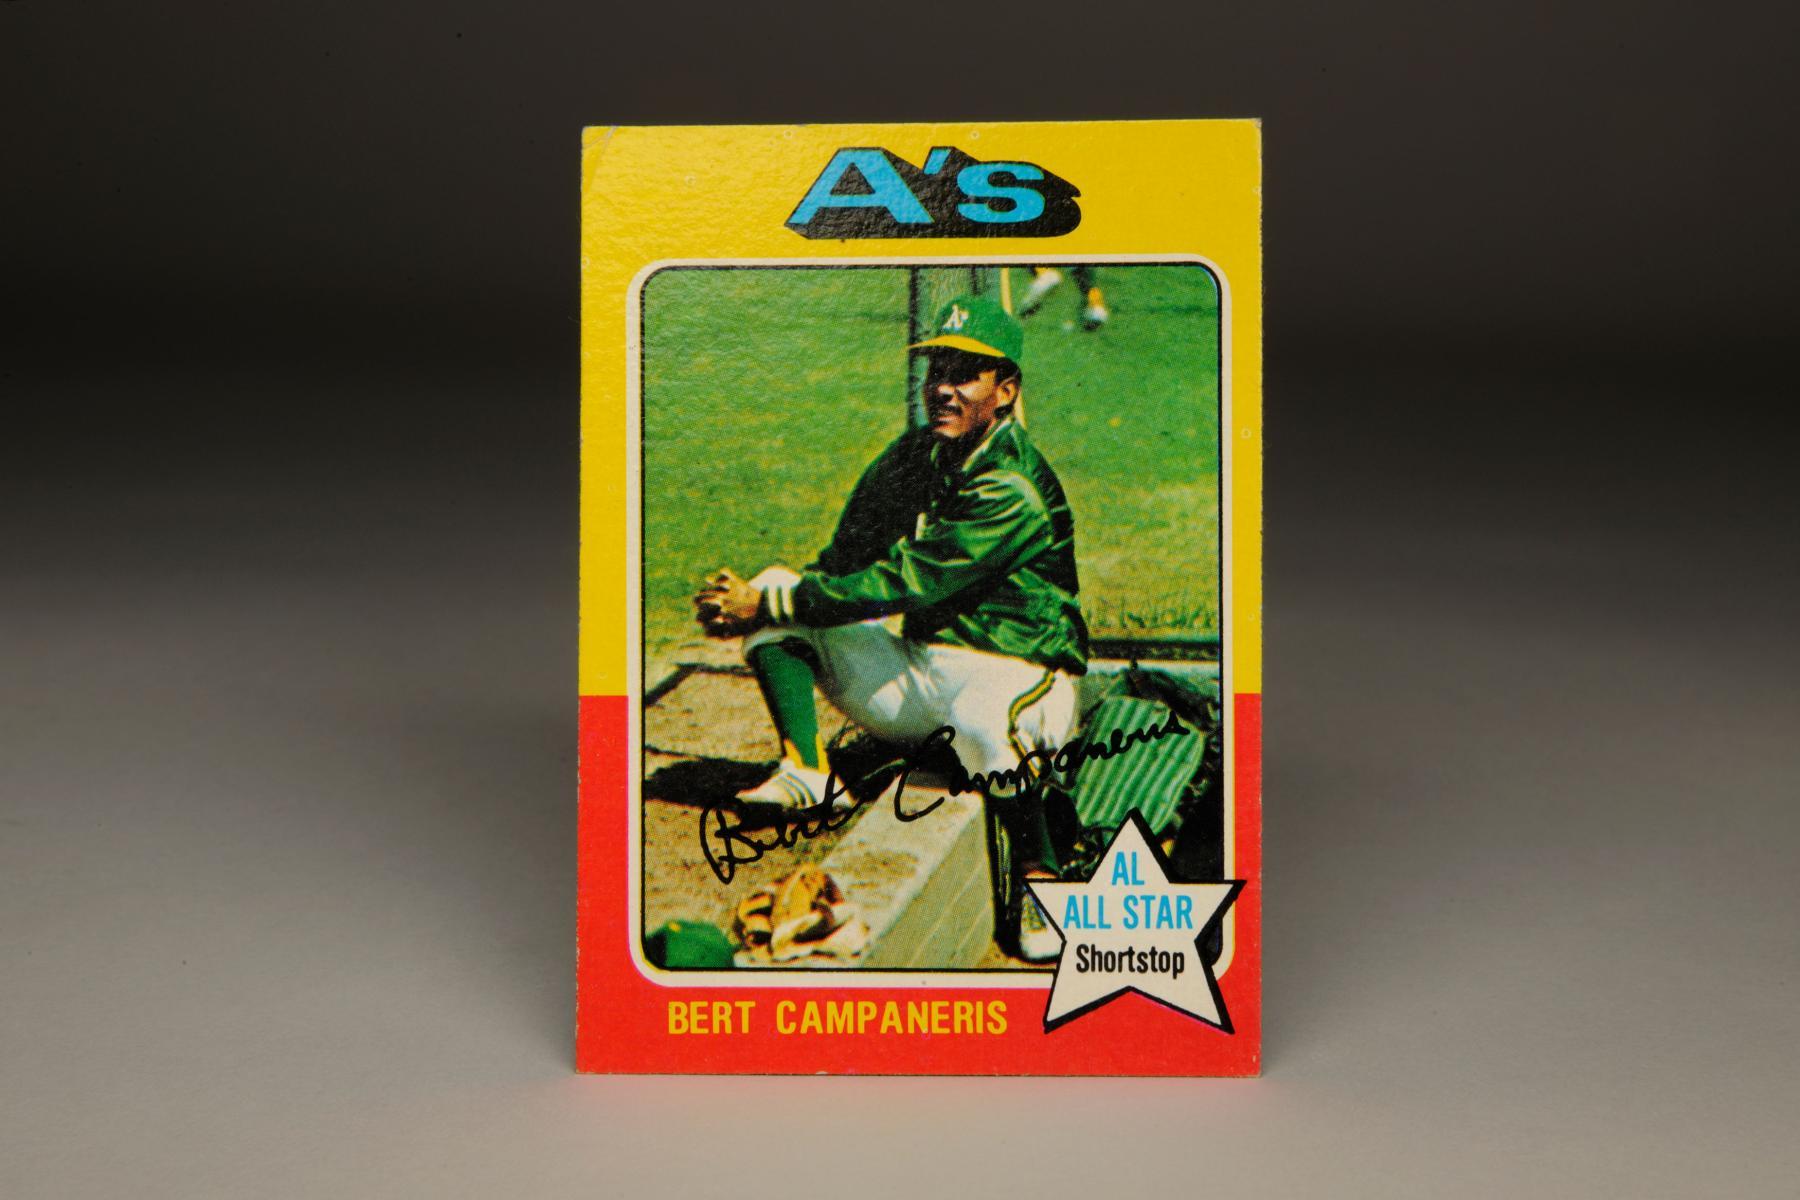 1975 Bert Campaneris Topps card, shot by Doug McWilliams. (Milo Stewart Jr. / National Baseball Hall of Fame)